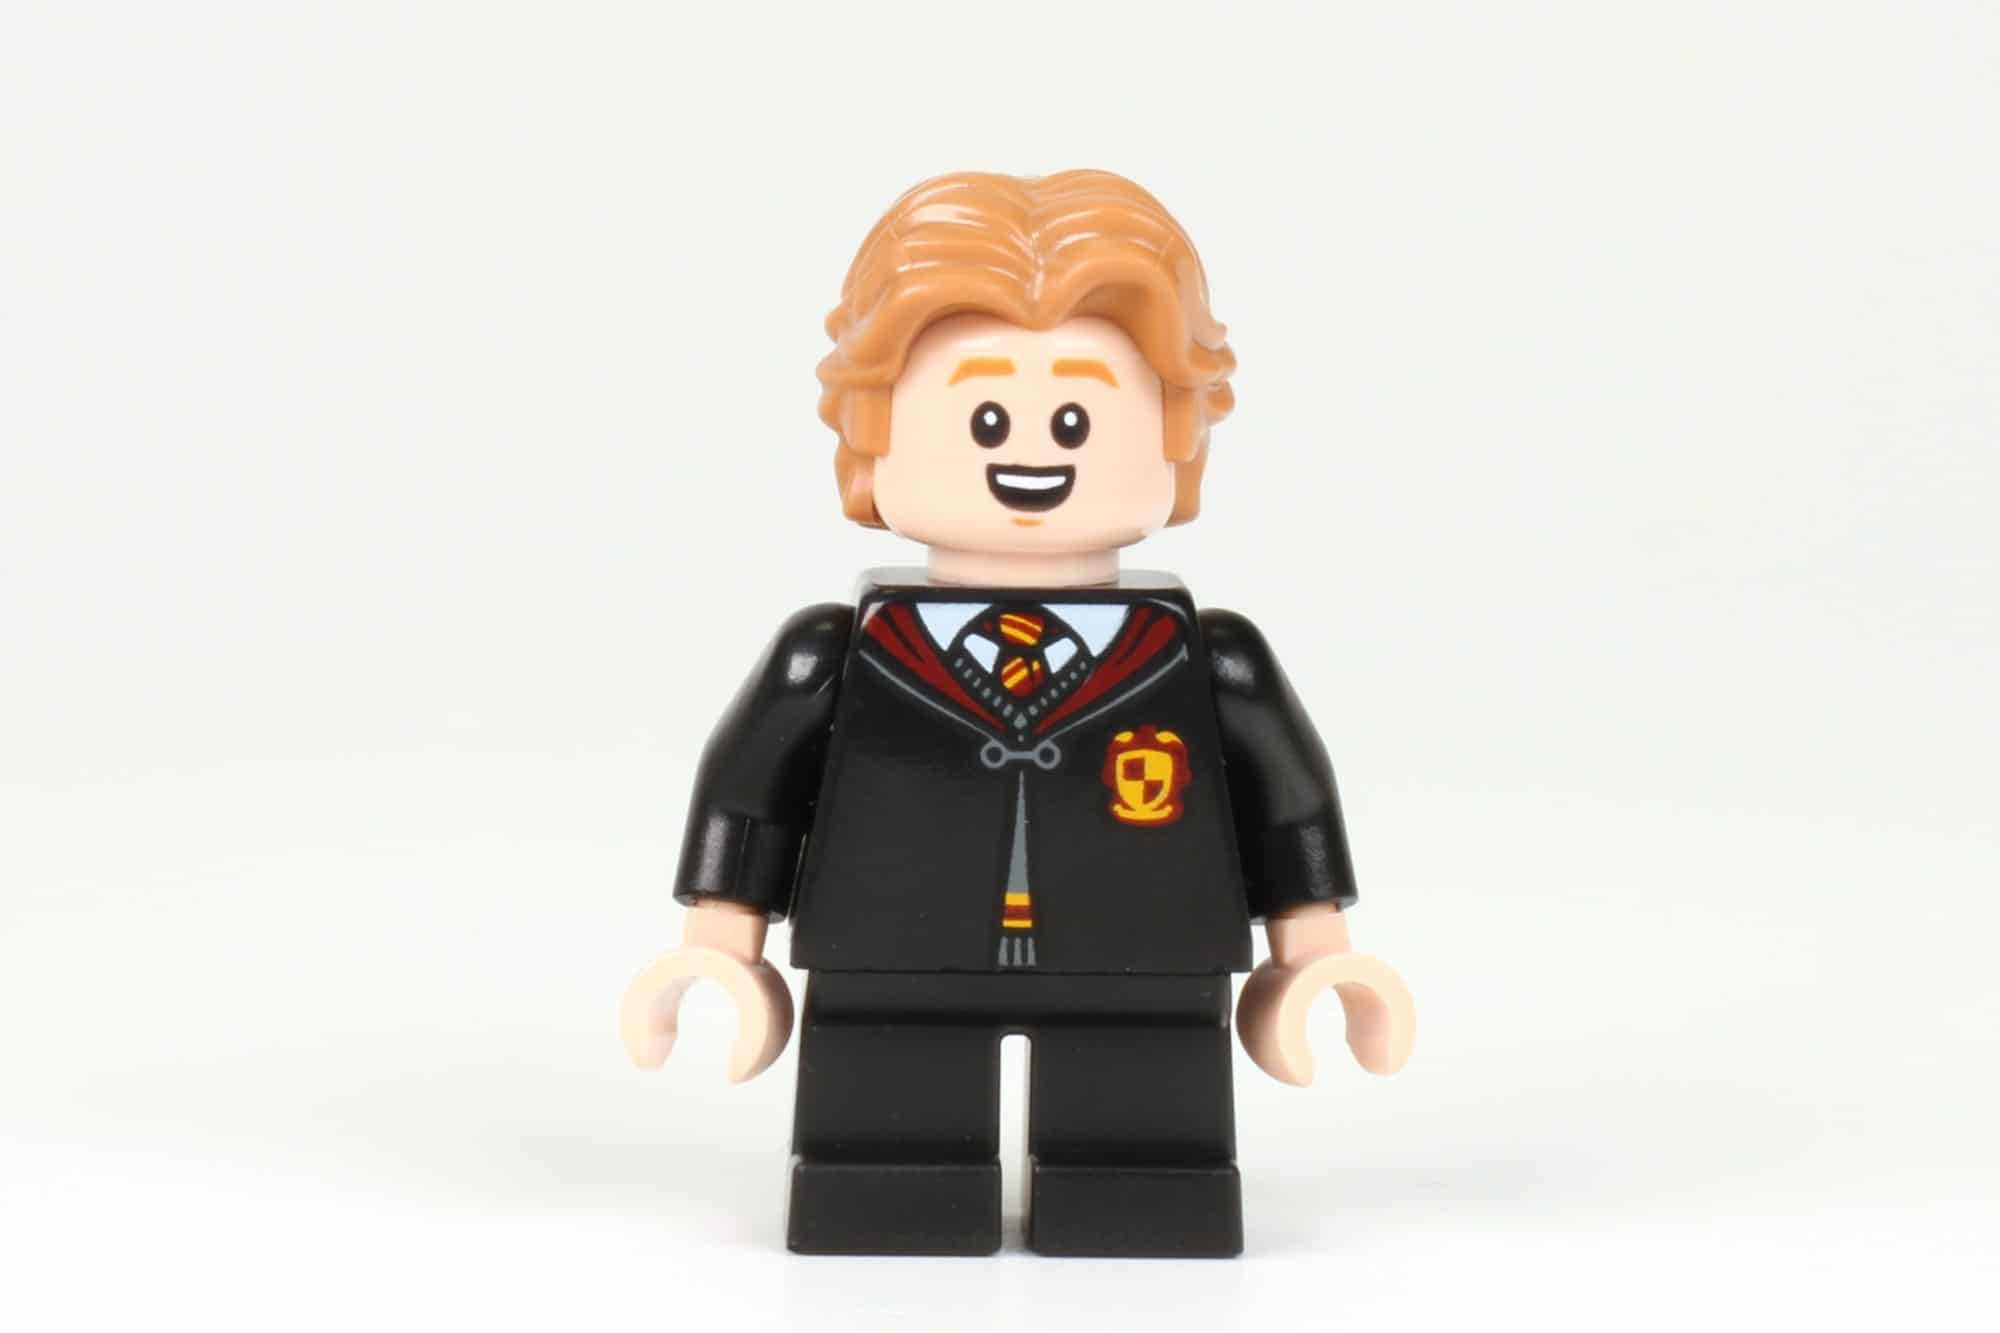 LEGO Harry Potter 76389 Hogwarts Kammer Des Schreckens Minifiguren 11 1